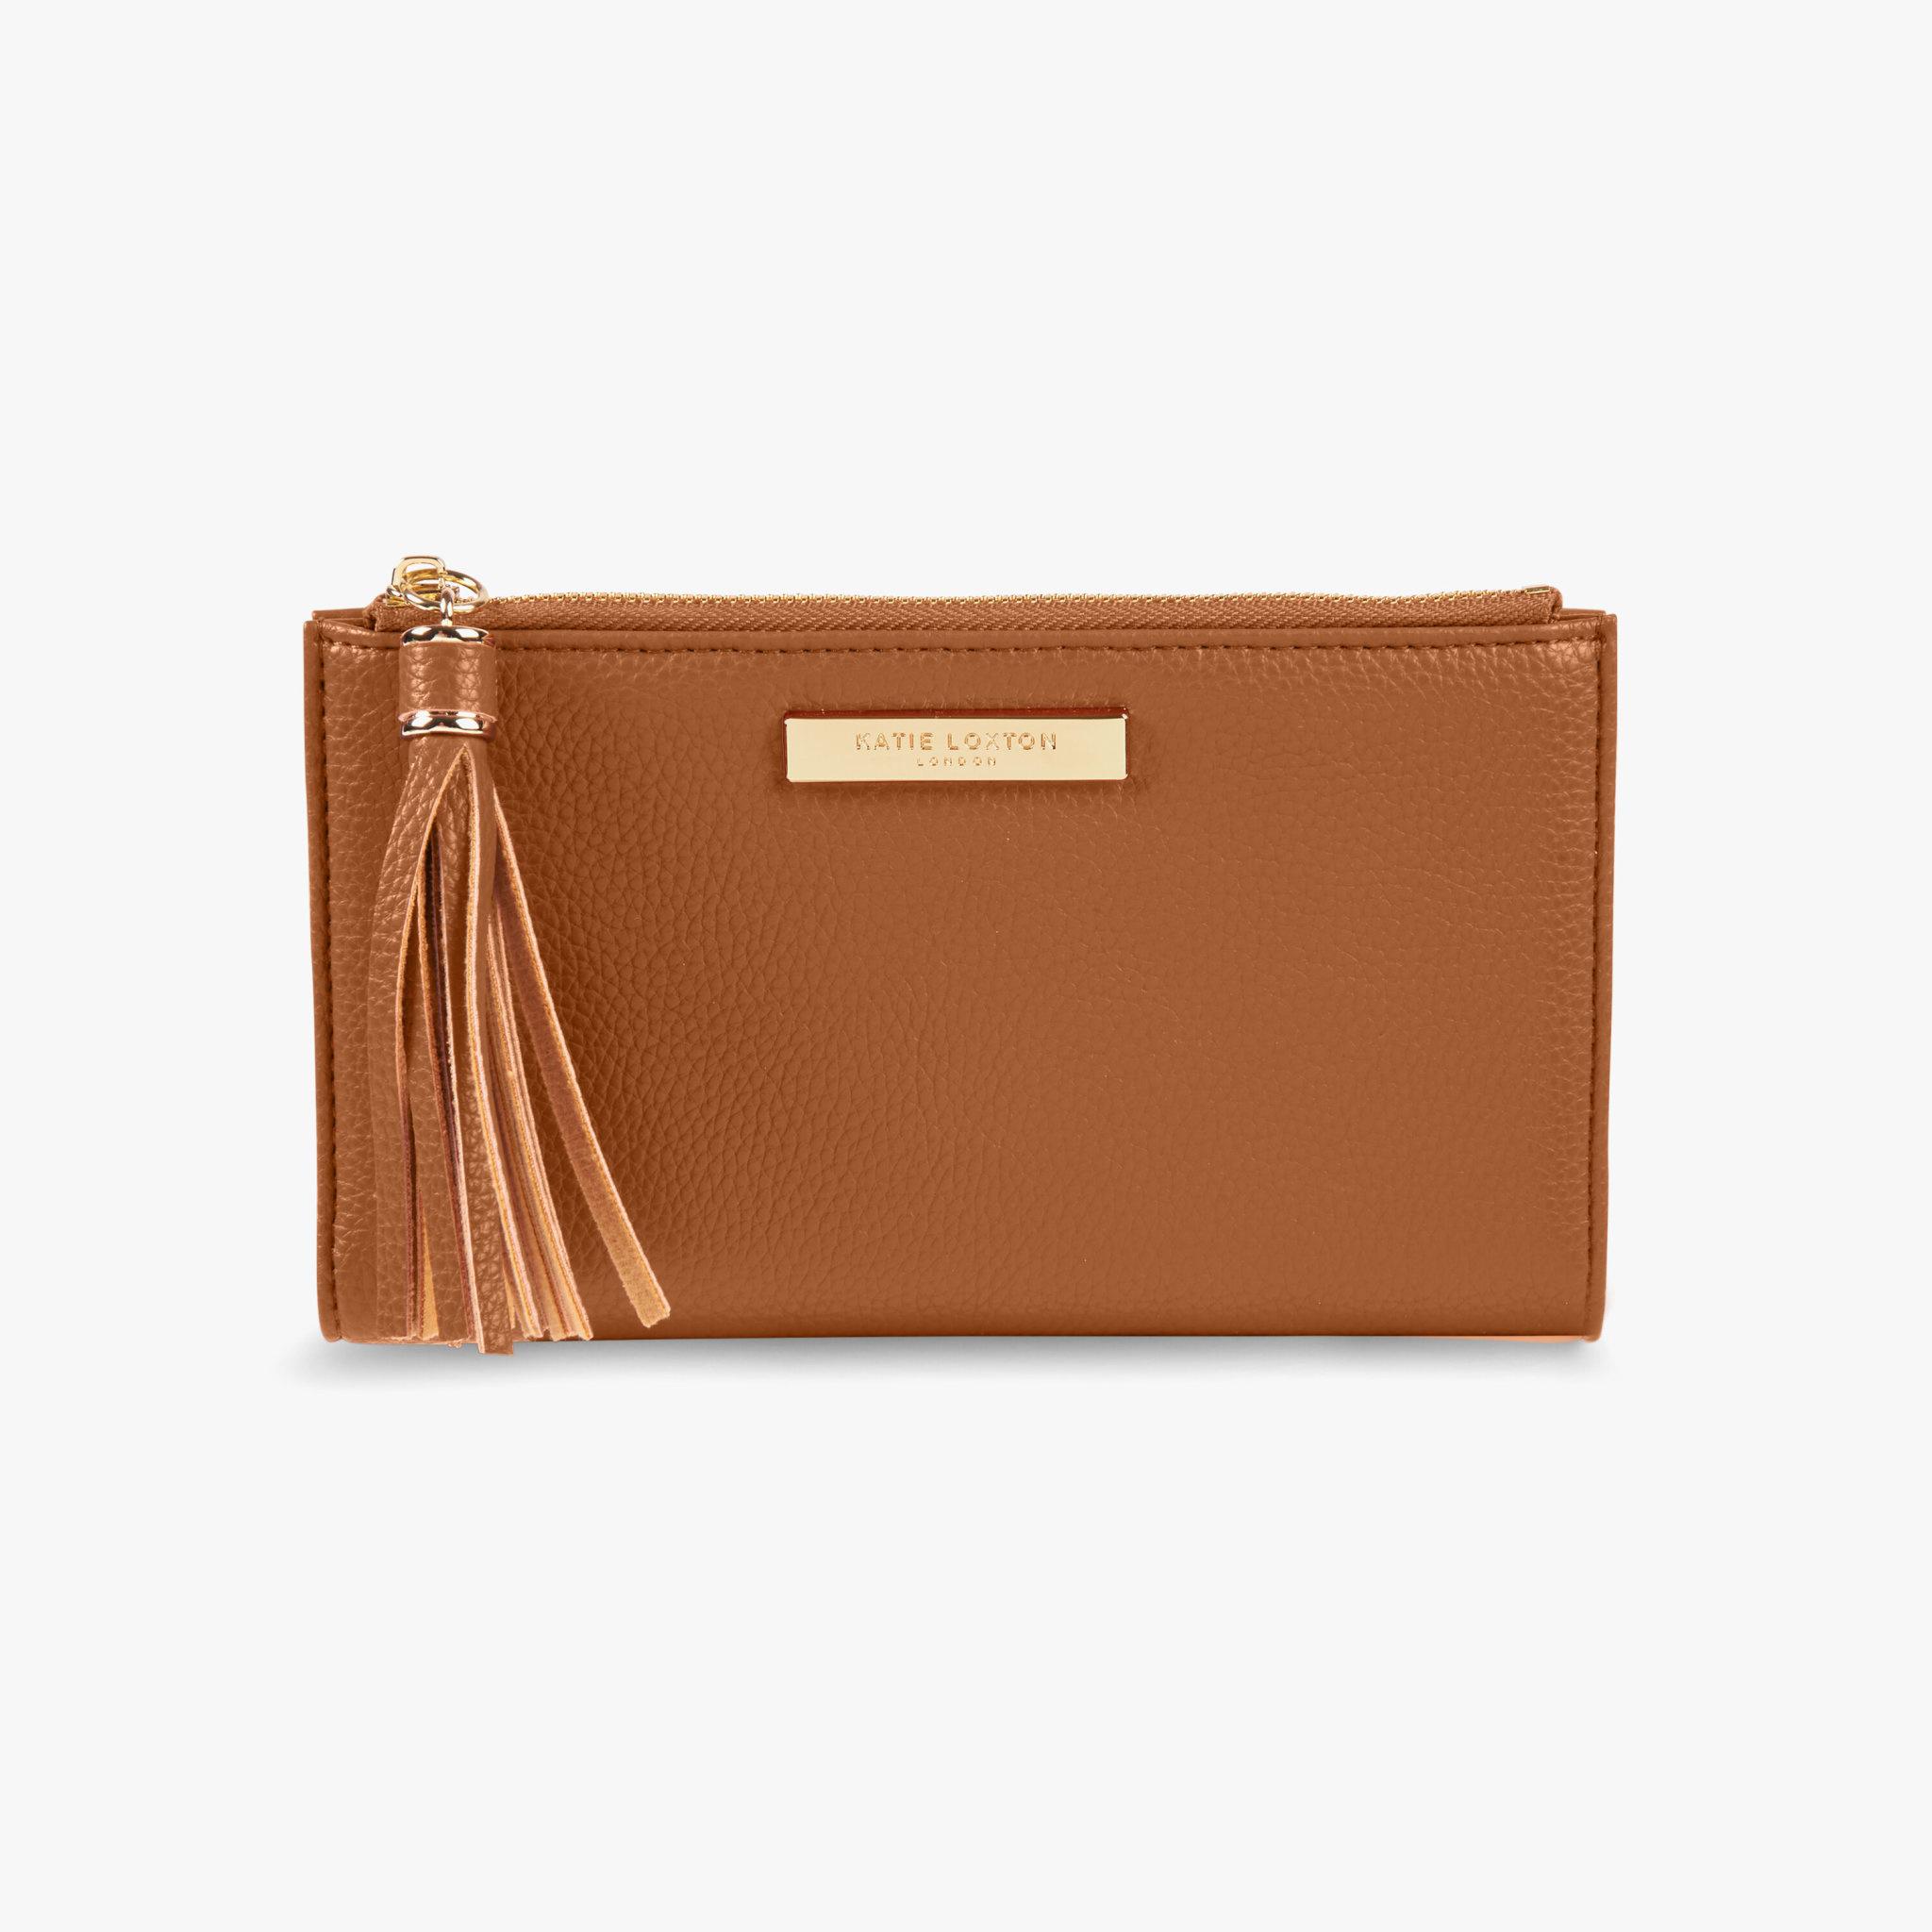 Katie Loxton Sophia tassel fold out purse  - Cognac - 11 x 19 cm